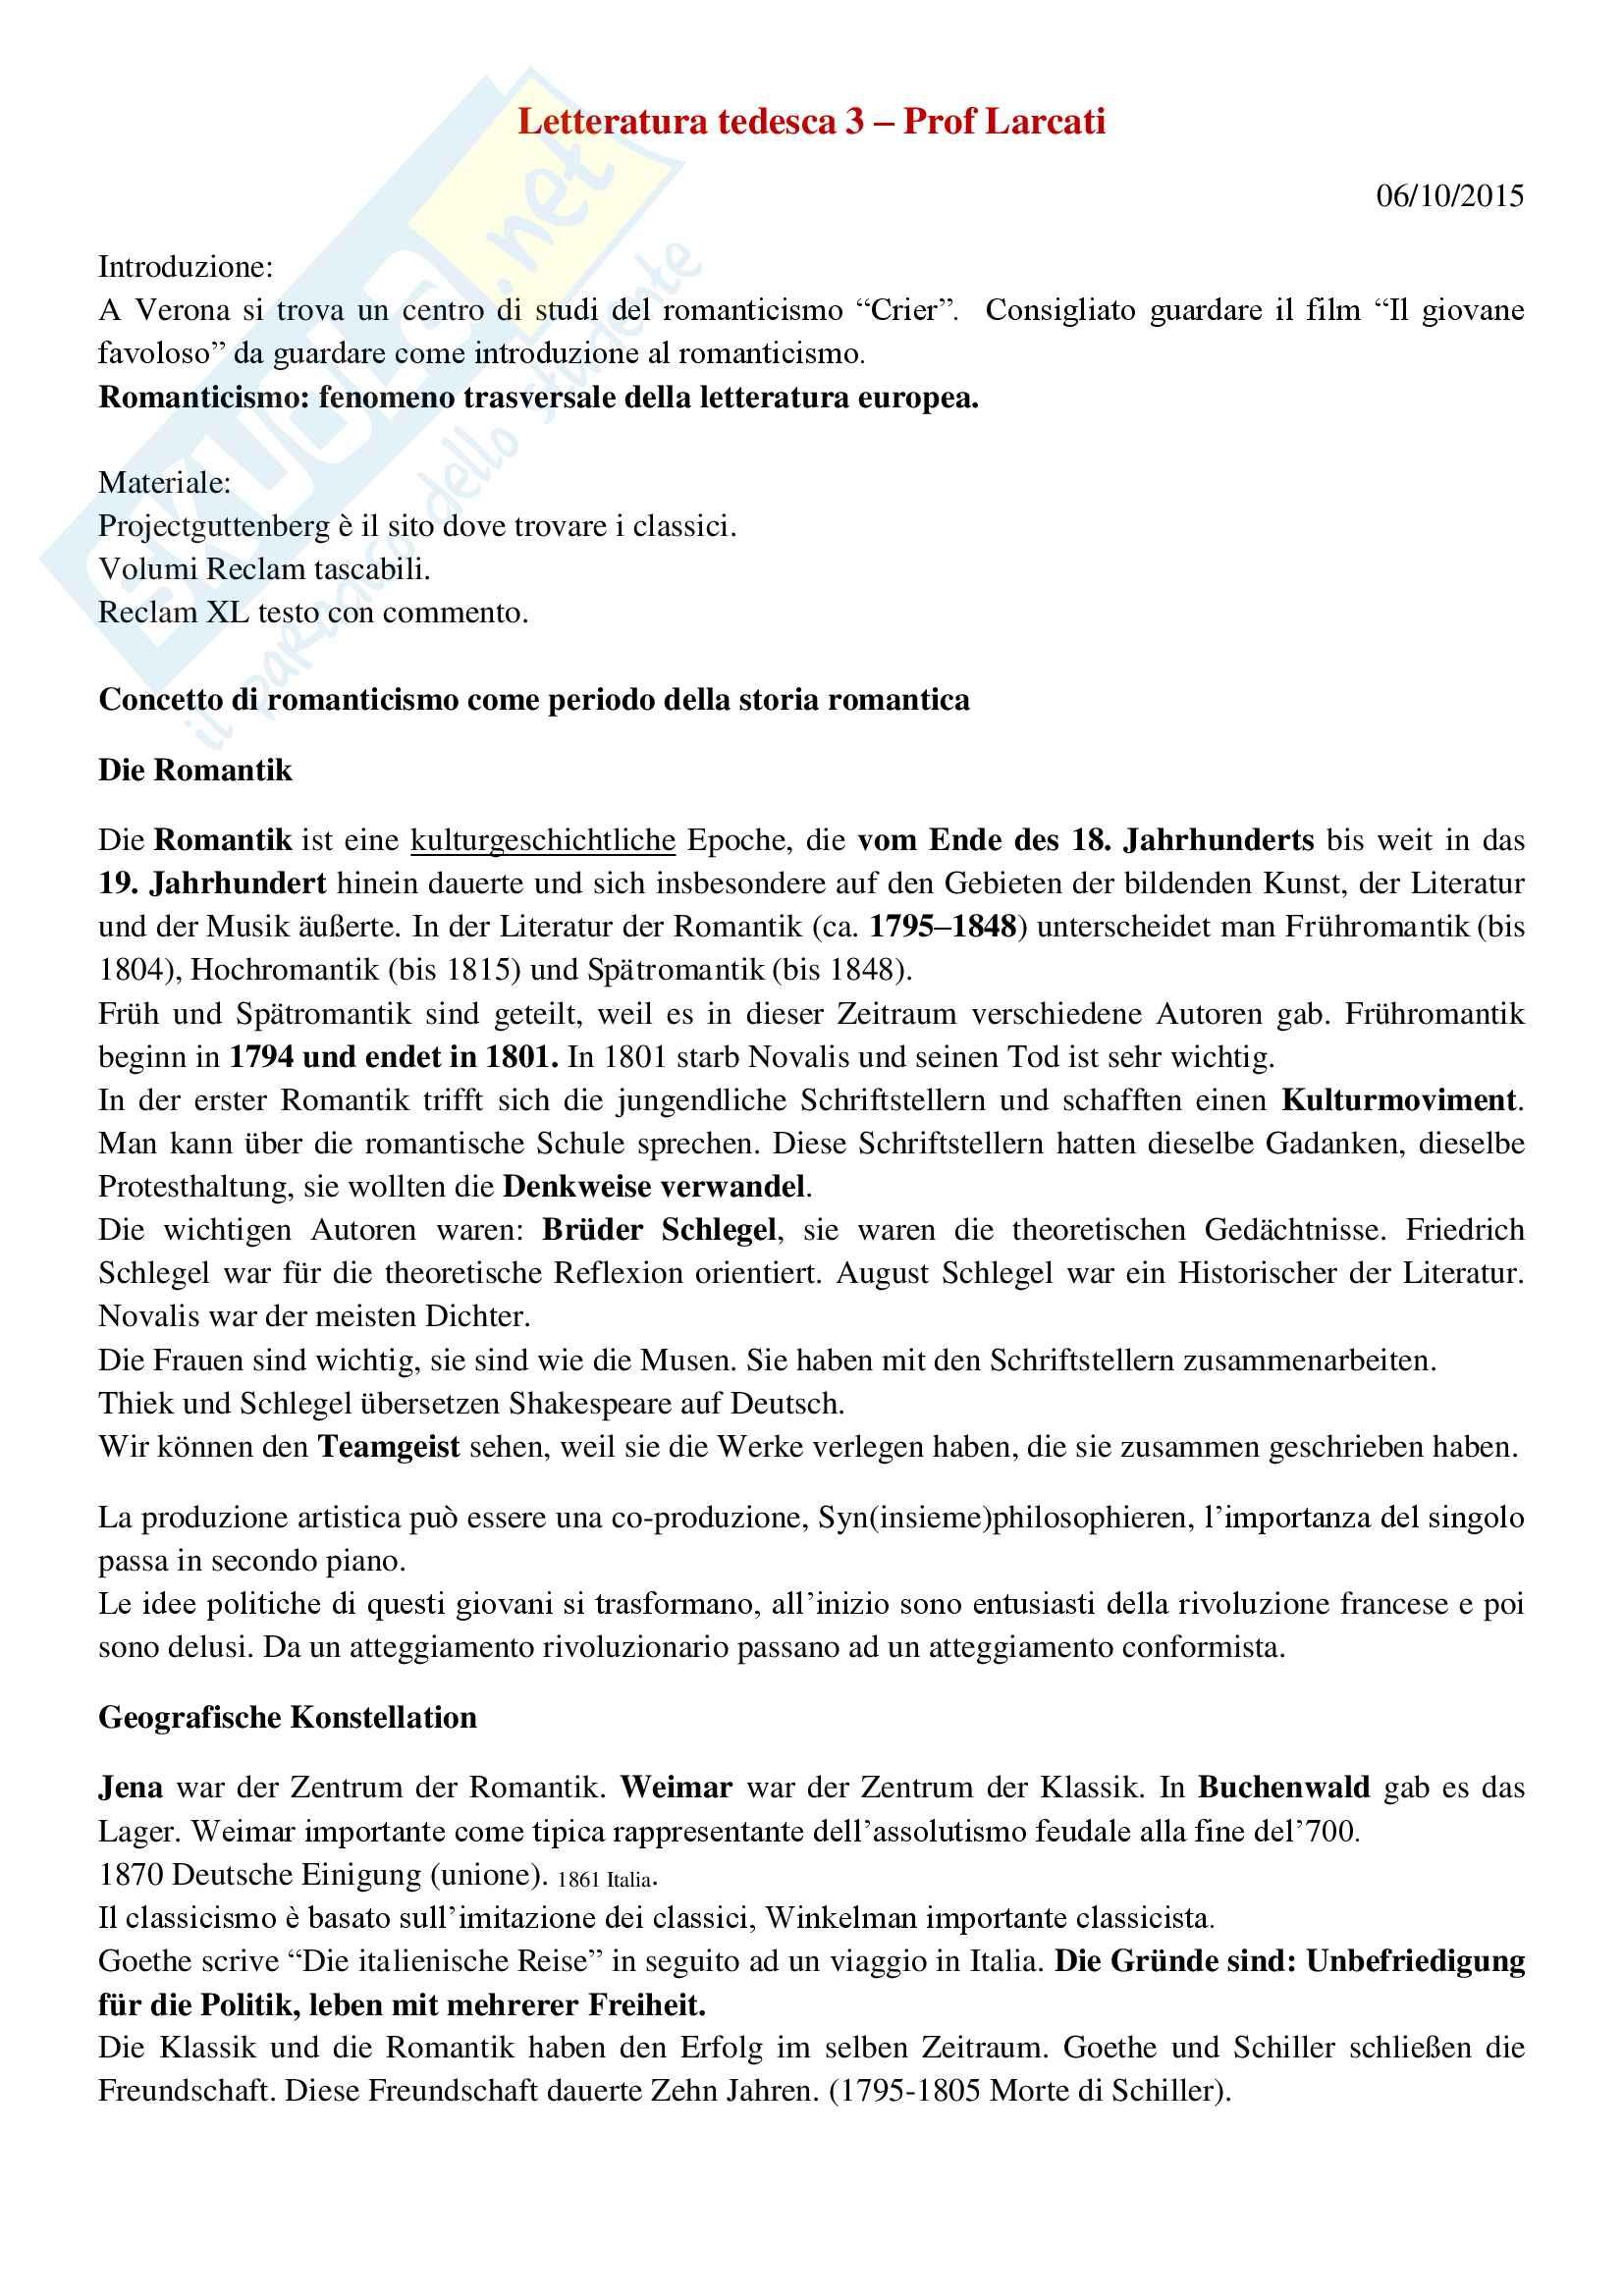 Letteratura tedesca 3